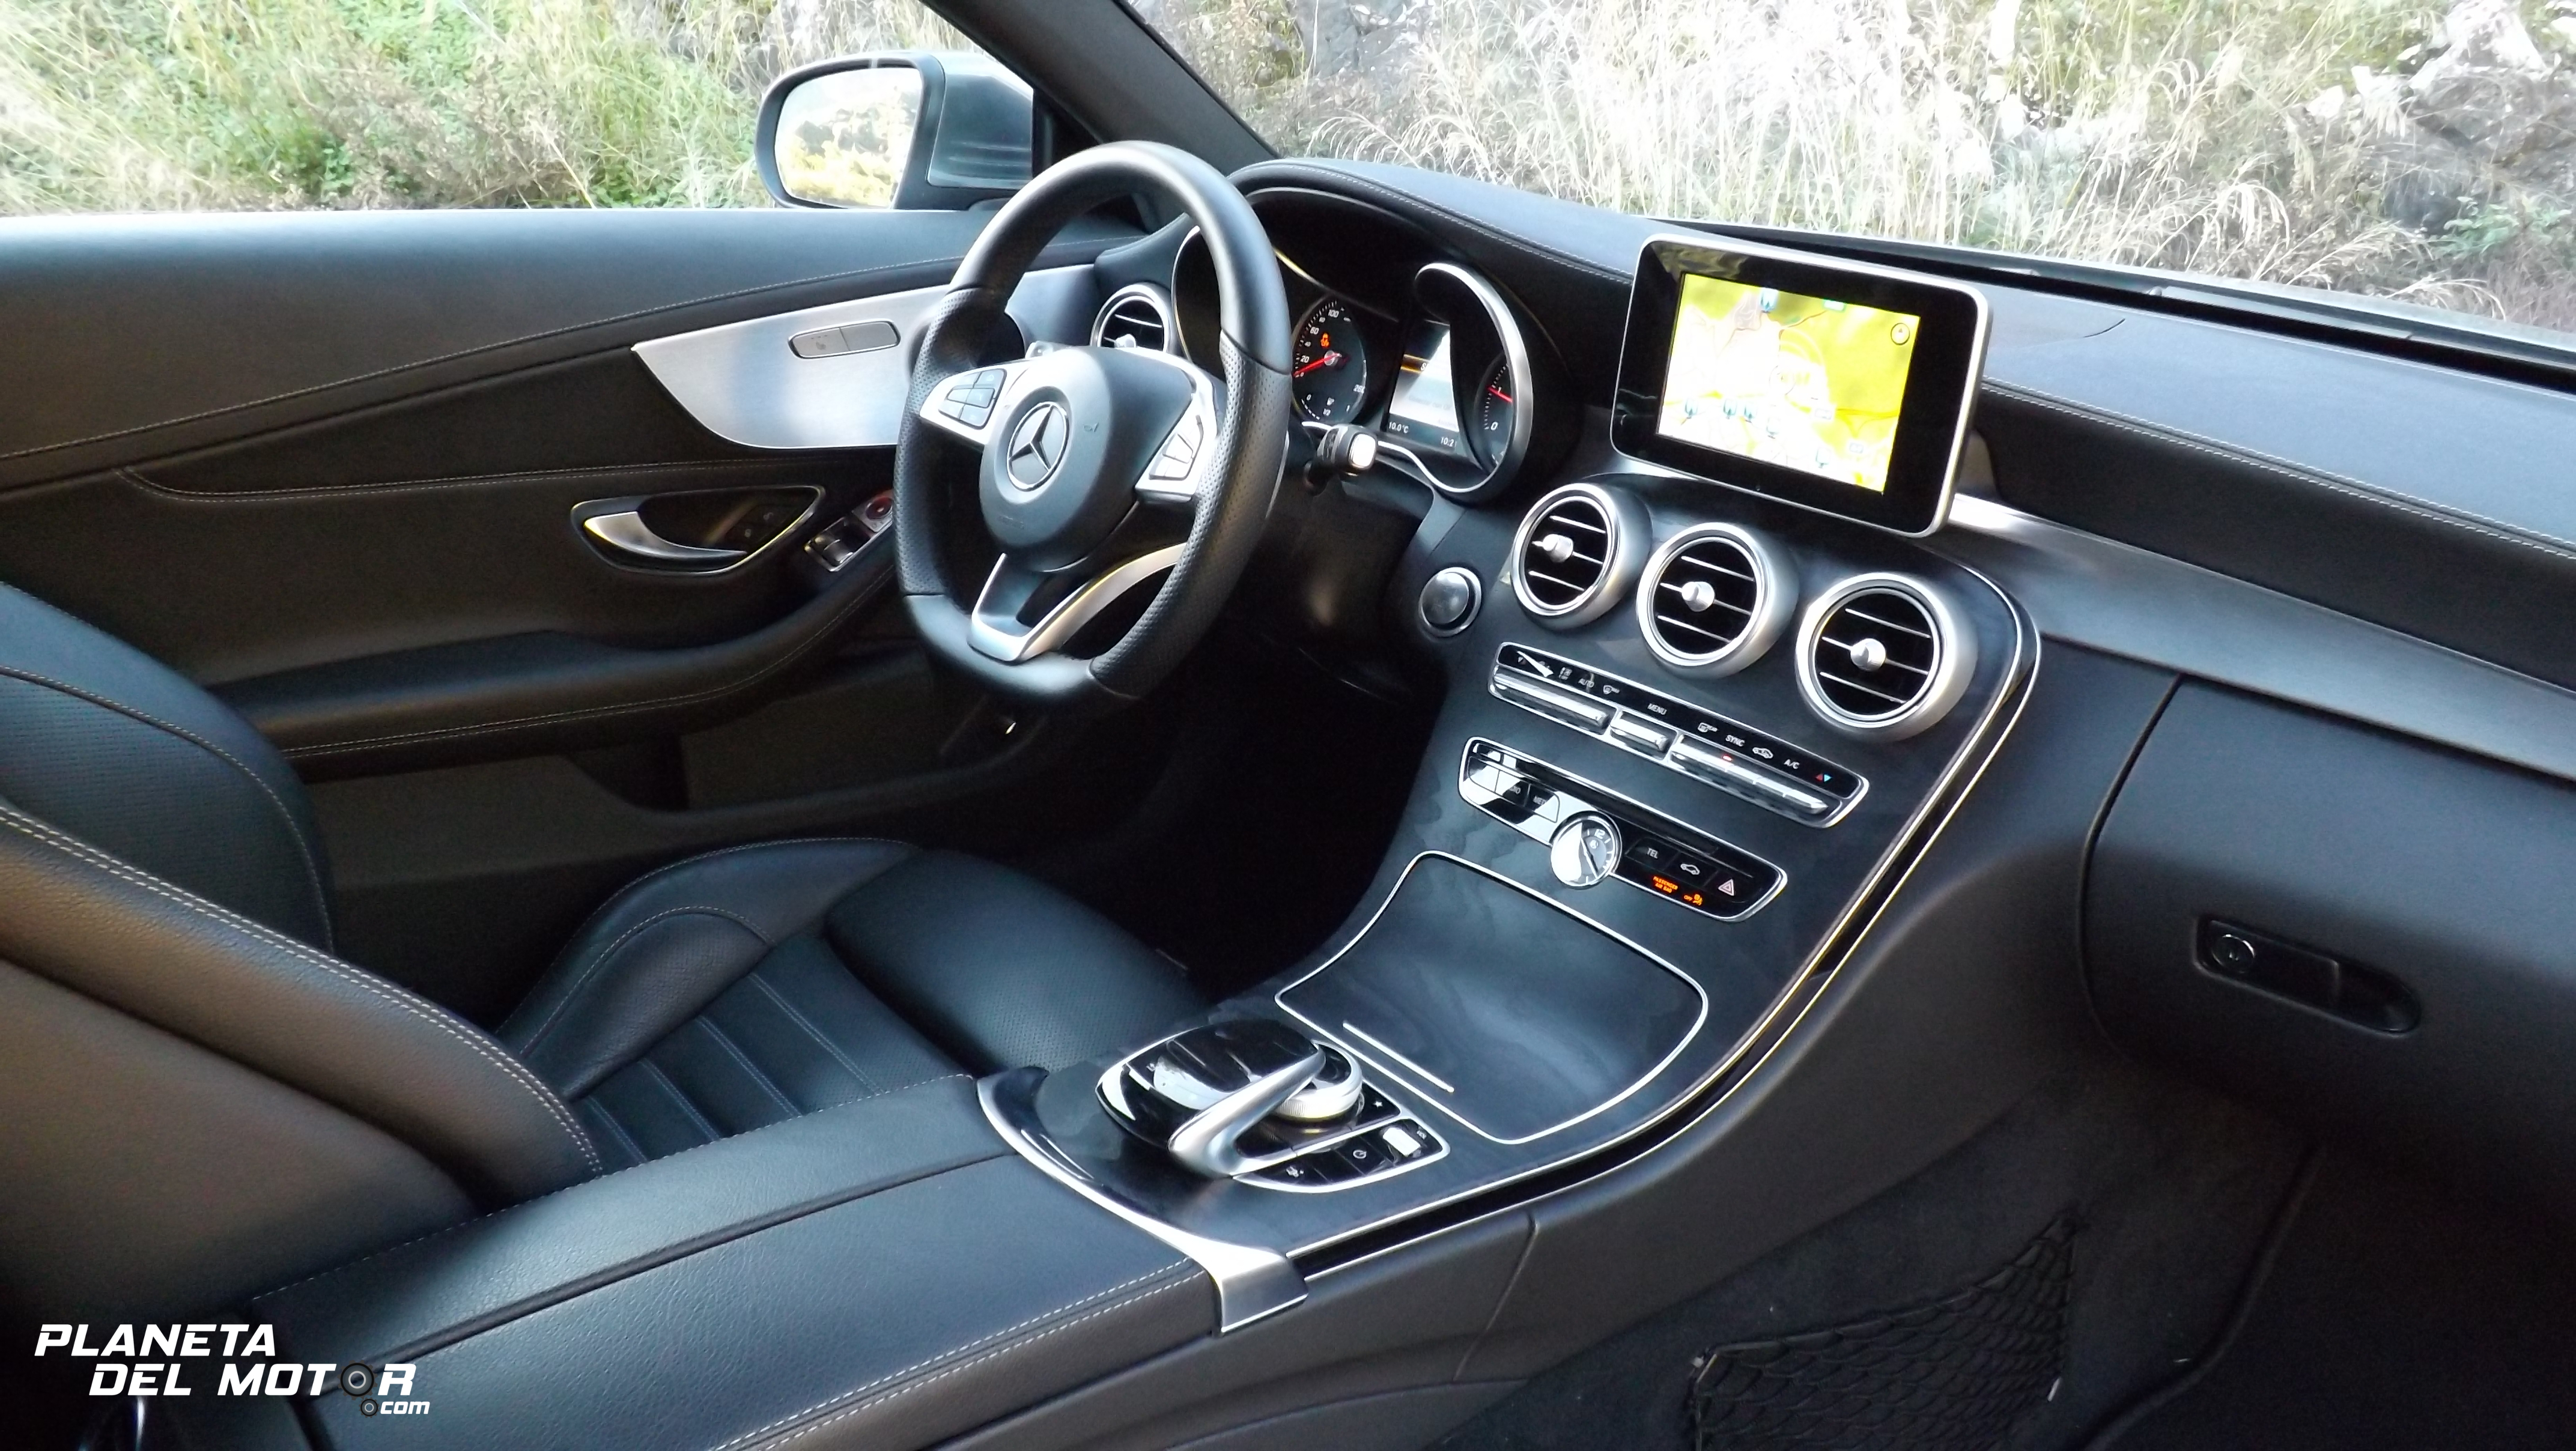 2017 mercedes c coupe interior 22 planeta del motor for Interior mercedes clase c